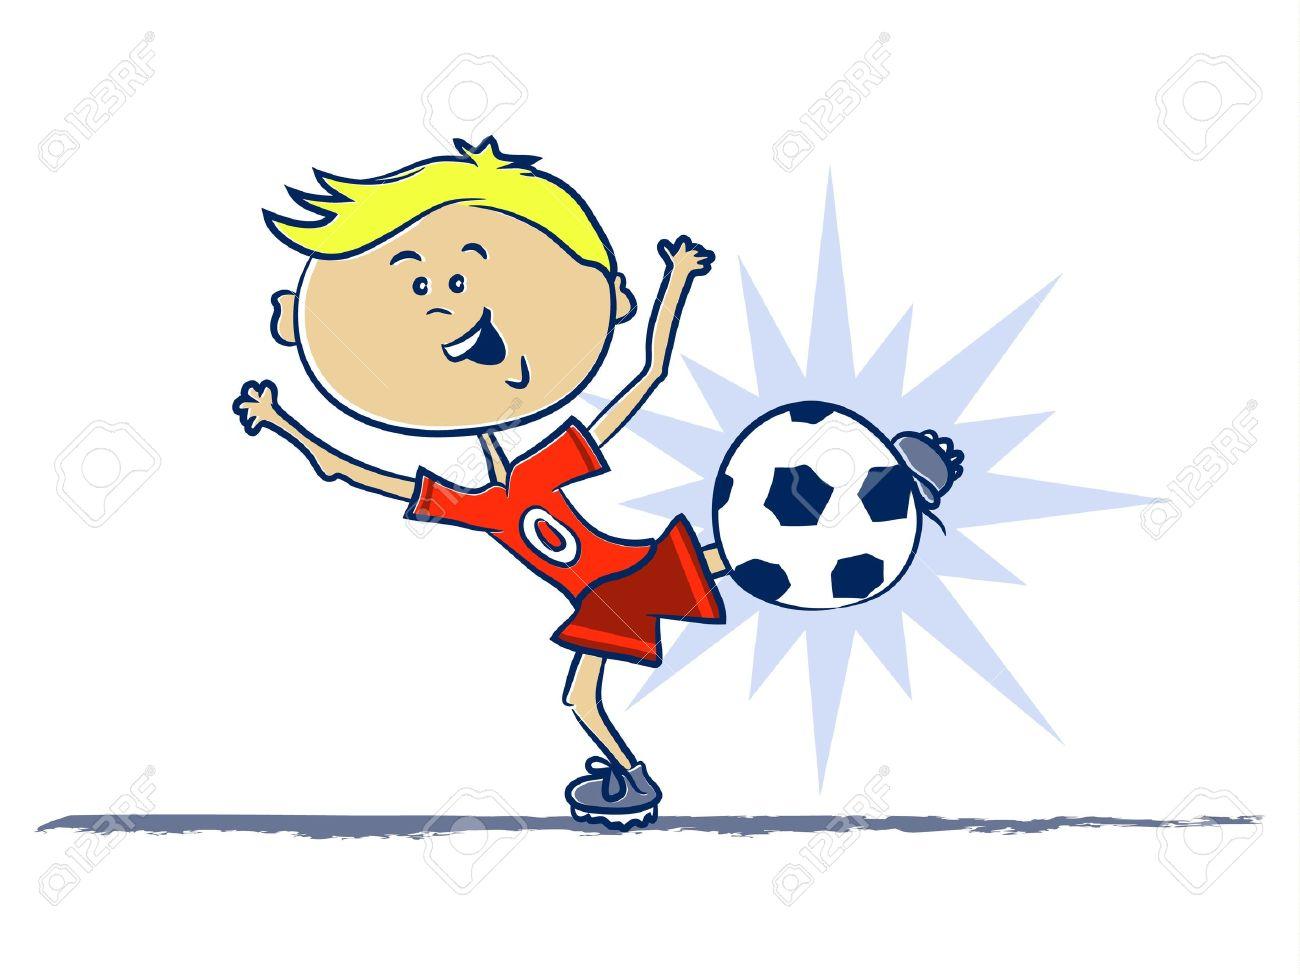 A Boy Kicking A Soccer Ball Cartoon Royalty Free Cliparts, Vectors.